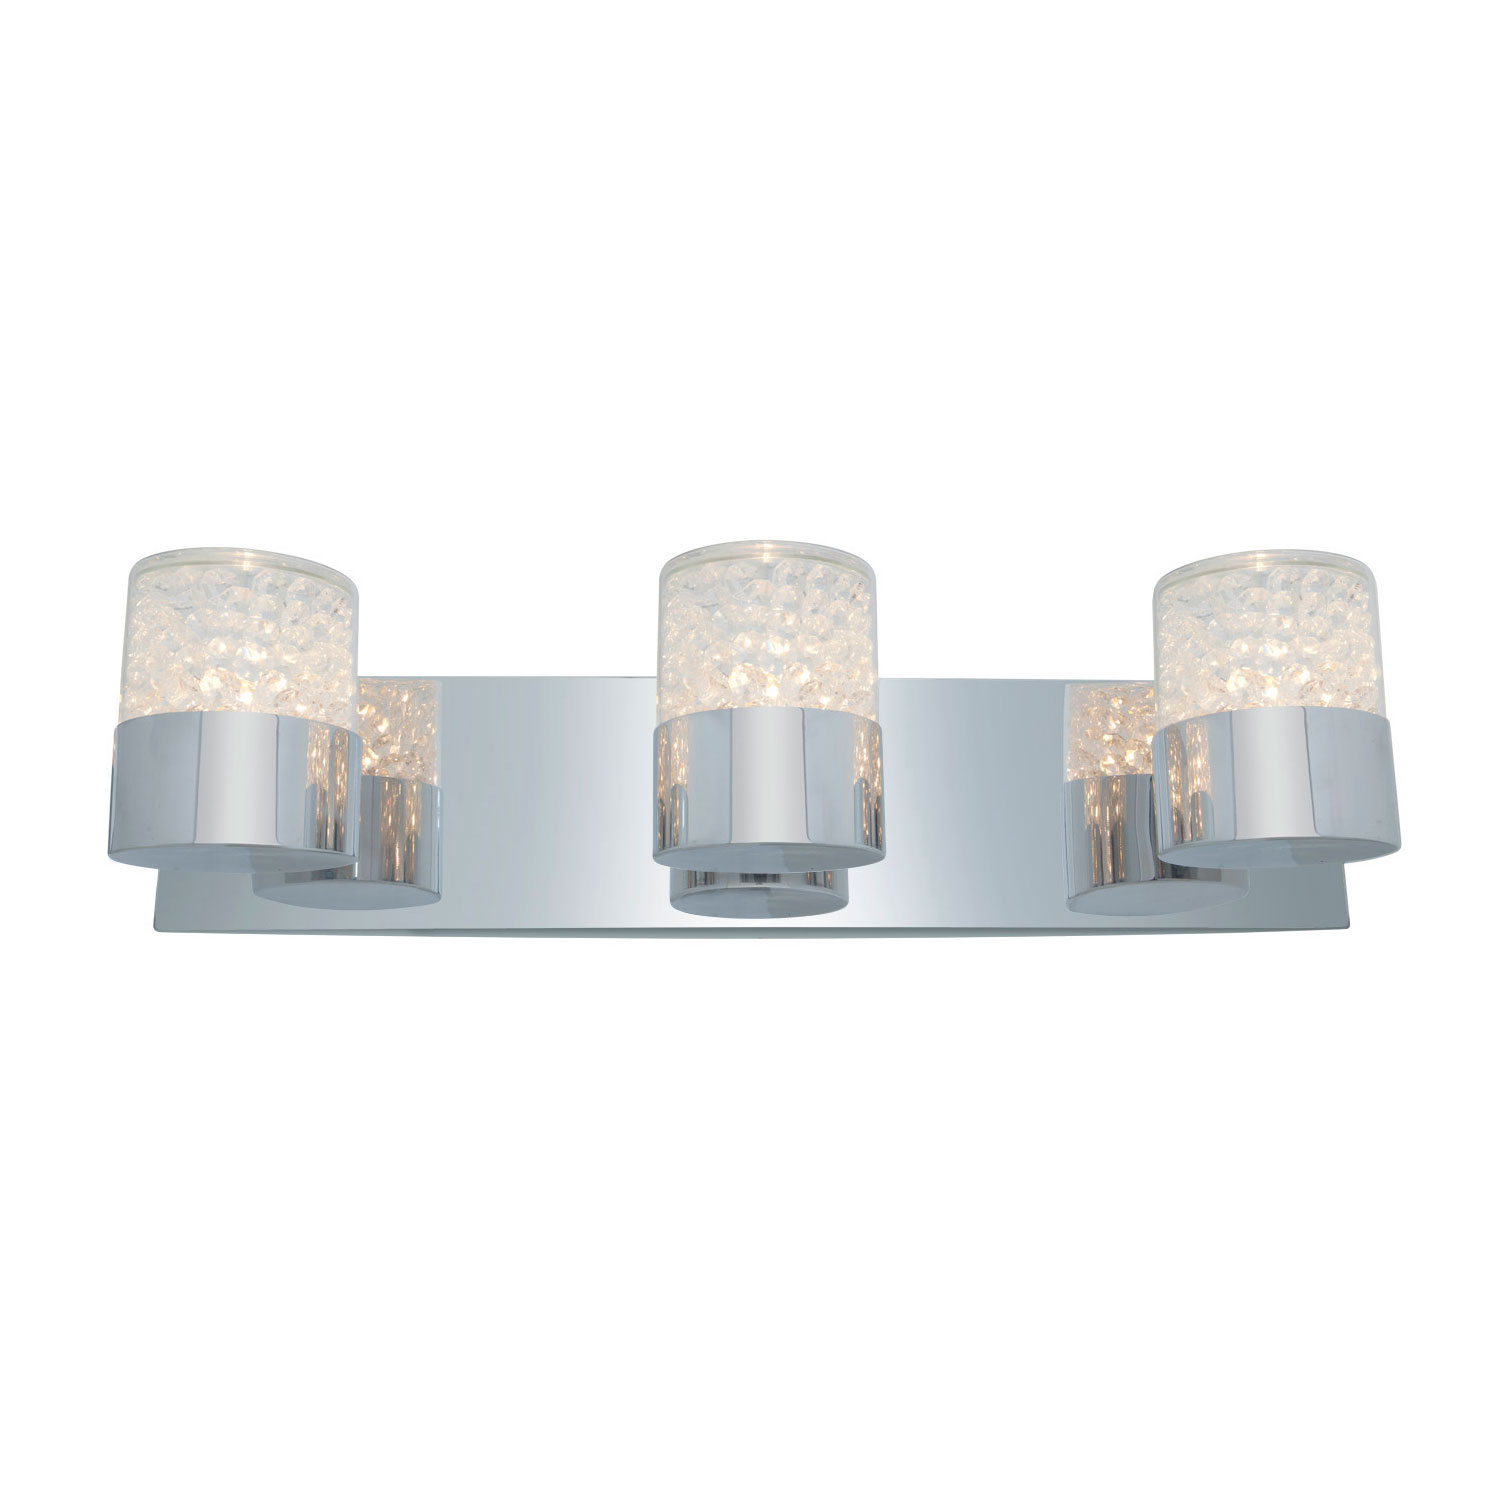 Kristal Crystal Bathroom Vanity Light By Access 51013 Ch Ccl